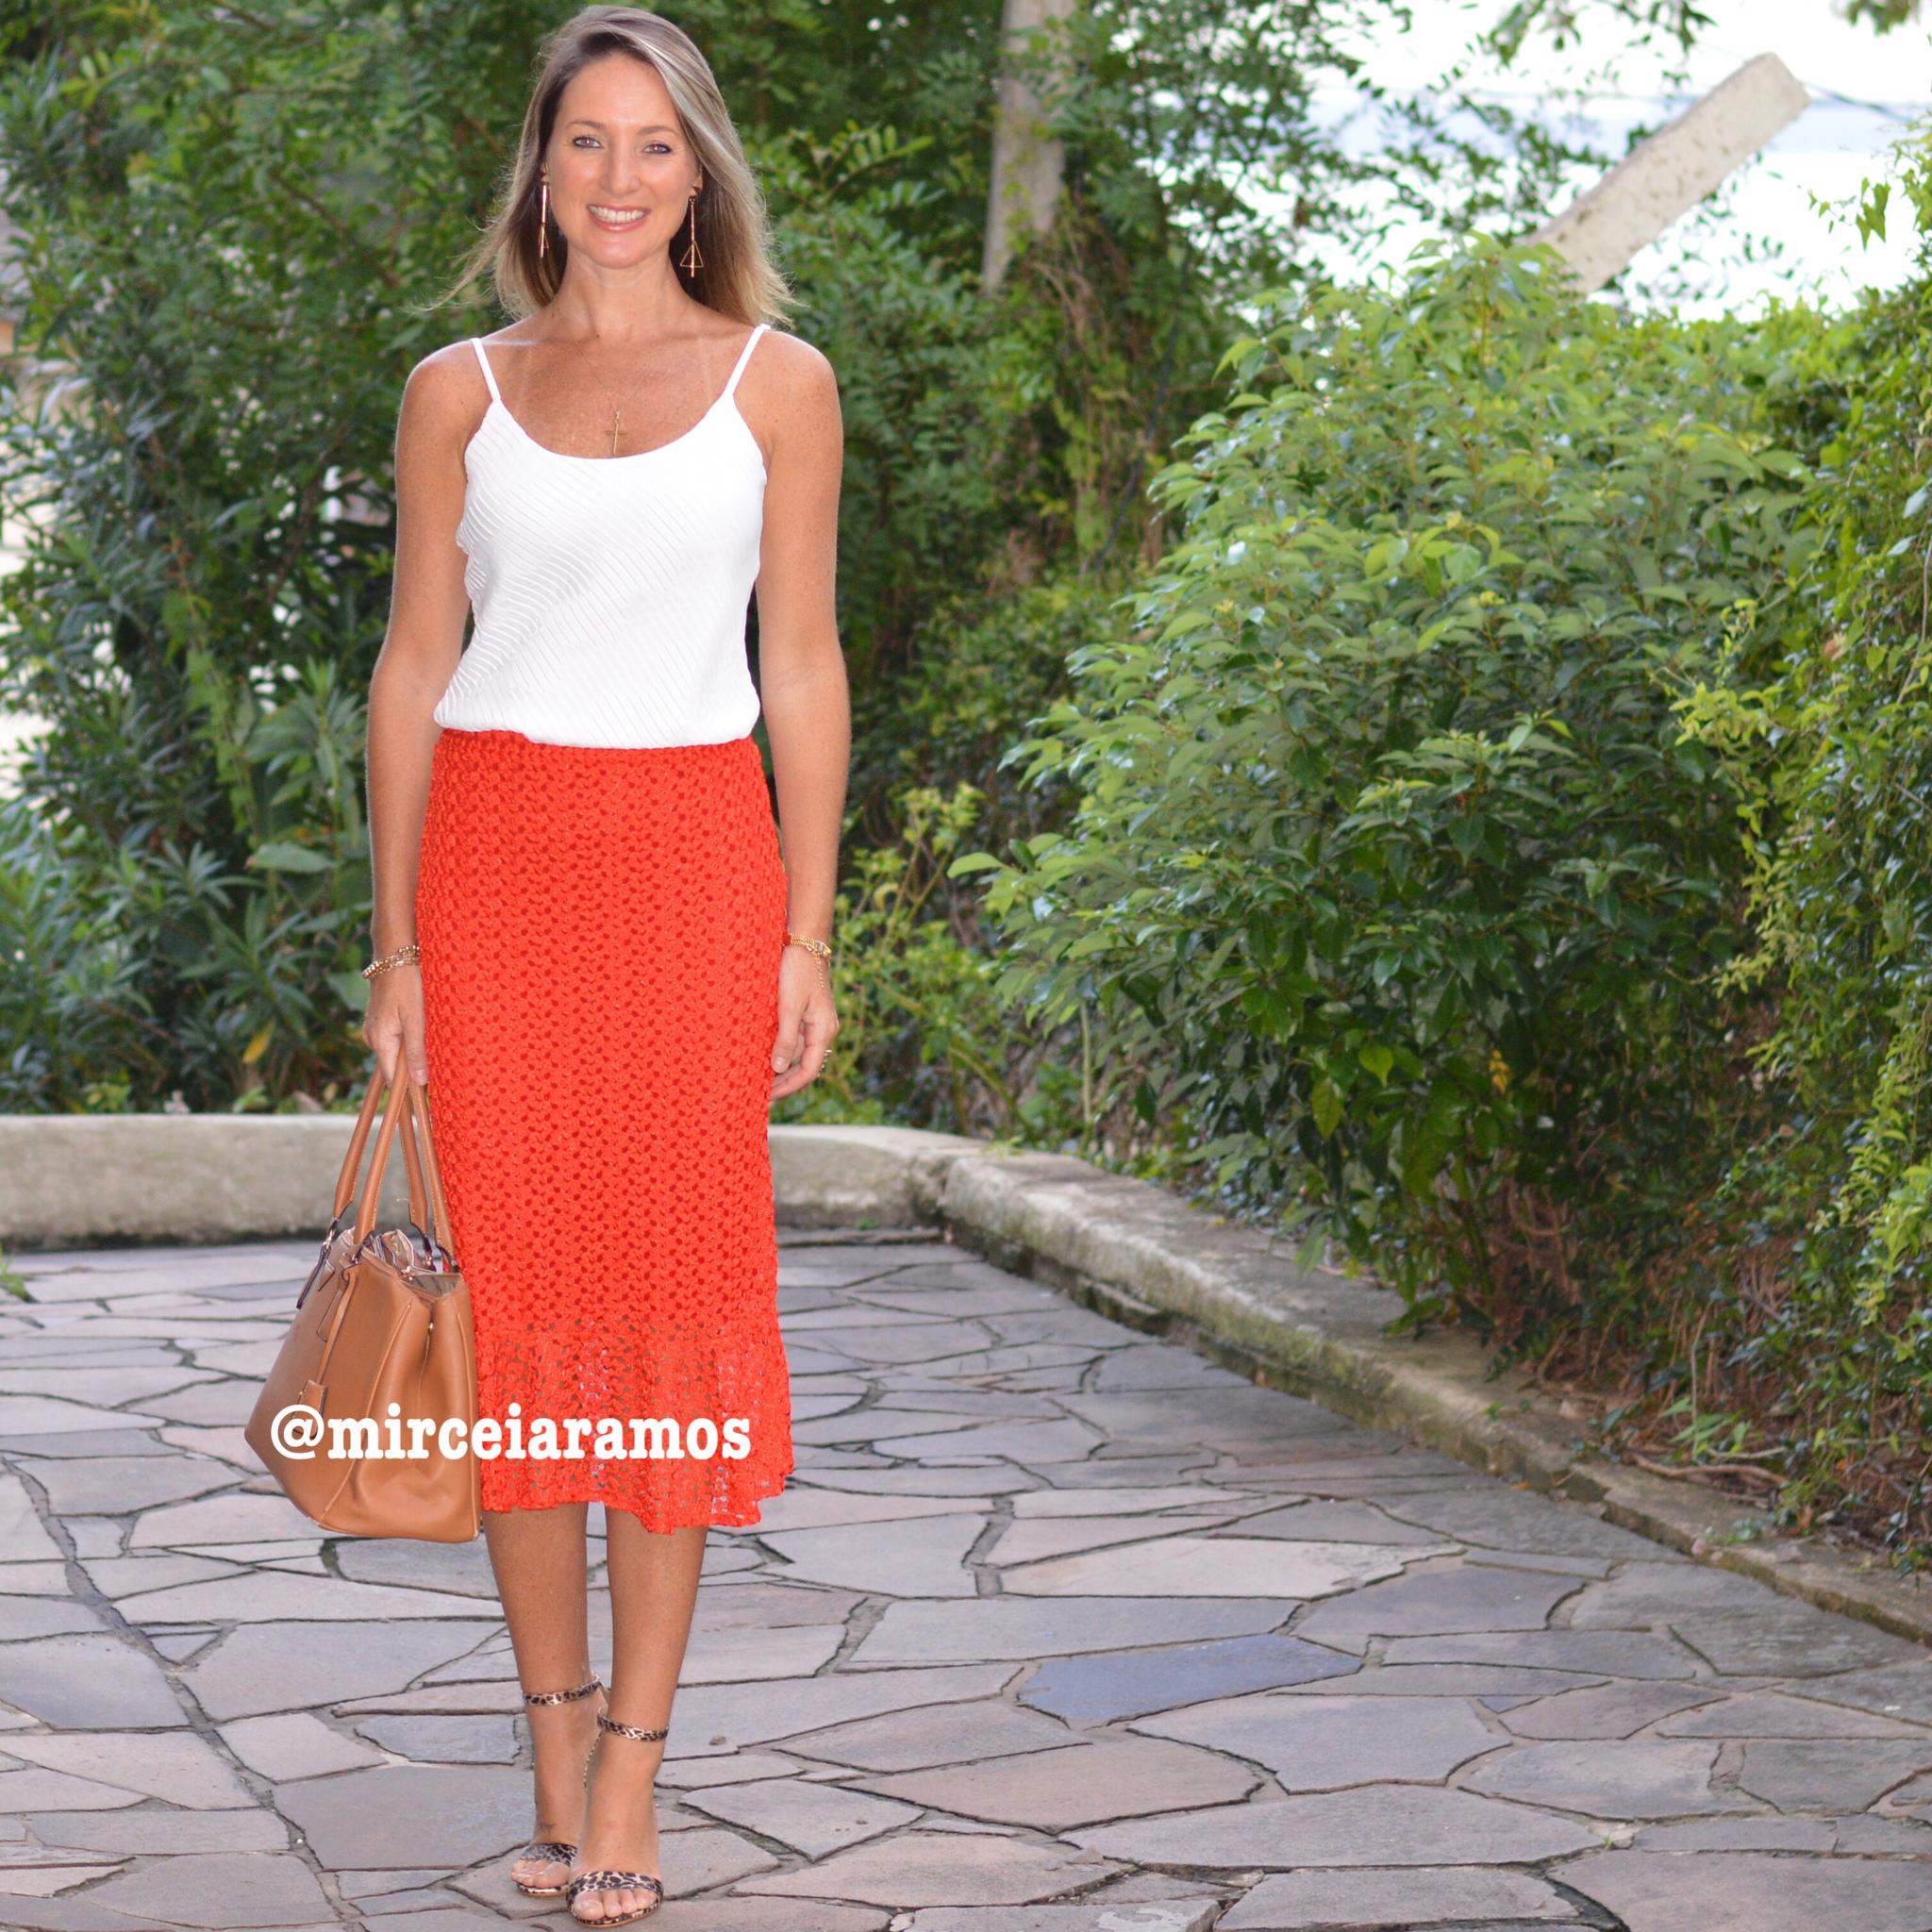 Look de trabalho - look do dia - look corporativo - moda no trabalho - work outfit - office outfit -  spring outfit - look executiva - summer outfit - saia laranja - crochê - white - Branco e laranja